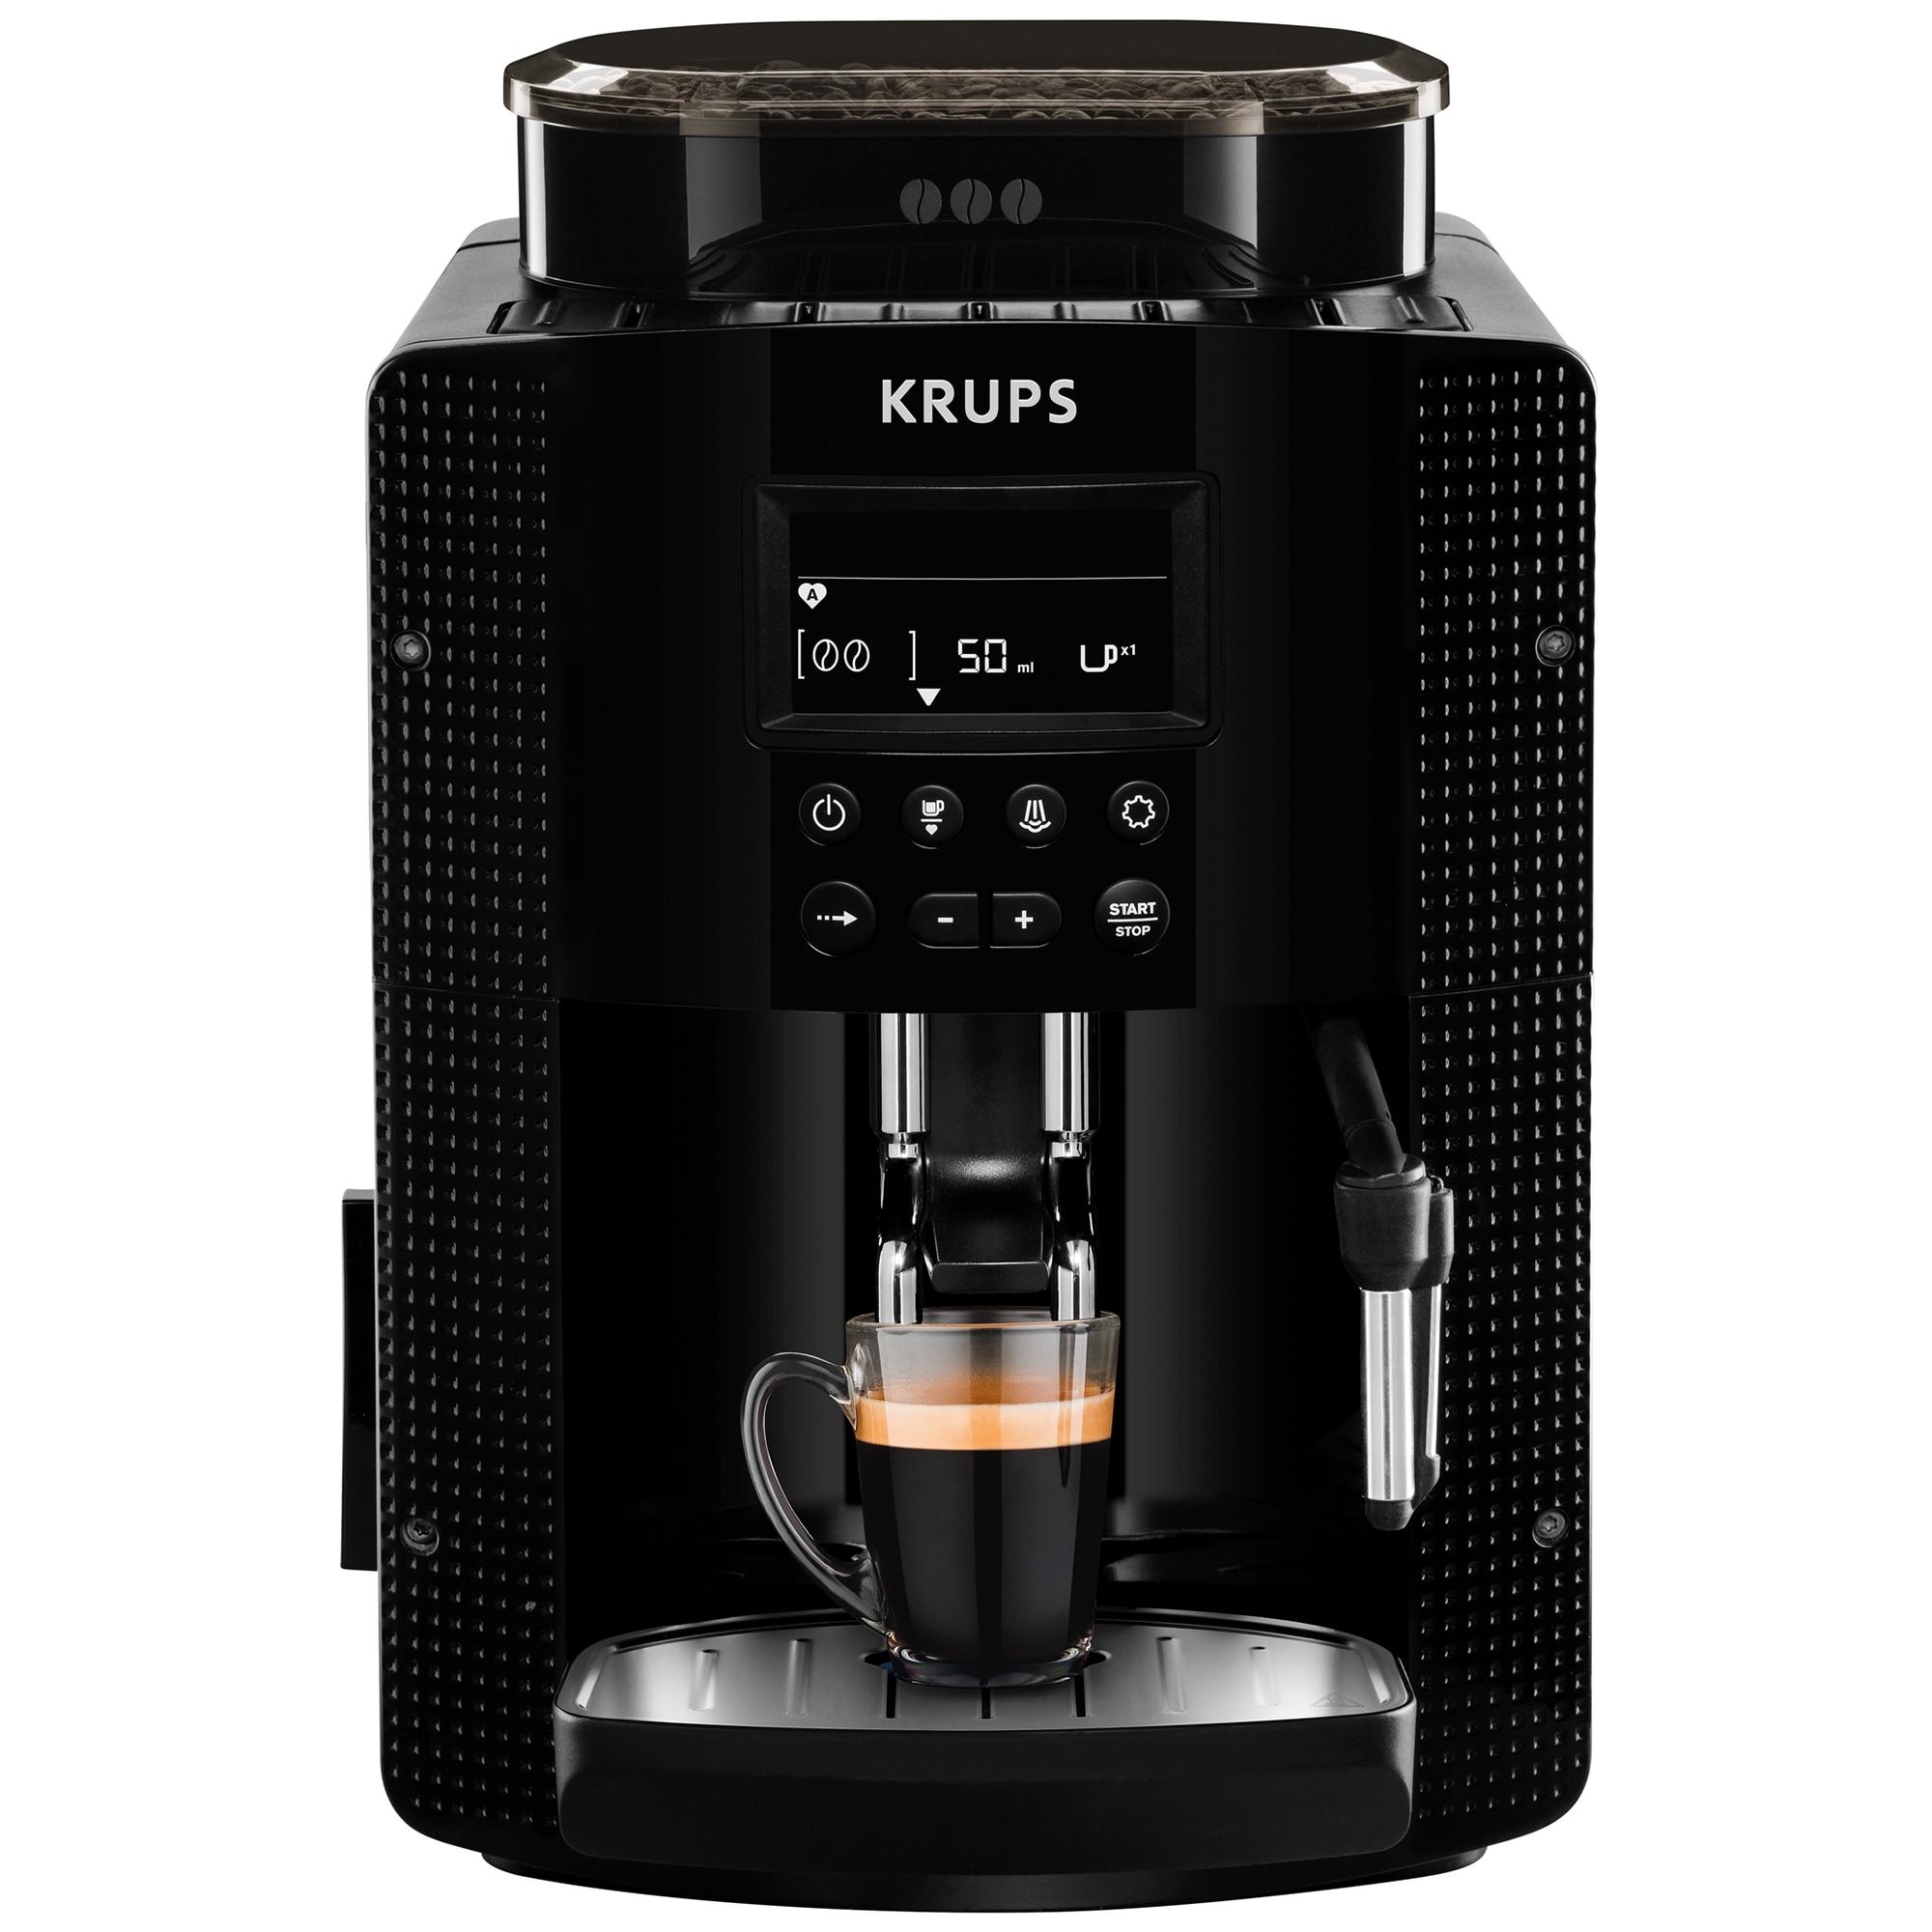 Fotografie Espressor automat Krups Essential EA81P070, 1450 W, Sistem Thermoblock, 15 bari, Ecran LCD, 3 functii, Duza pentru cappuccino, Recipient boabe de 260g, Negru